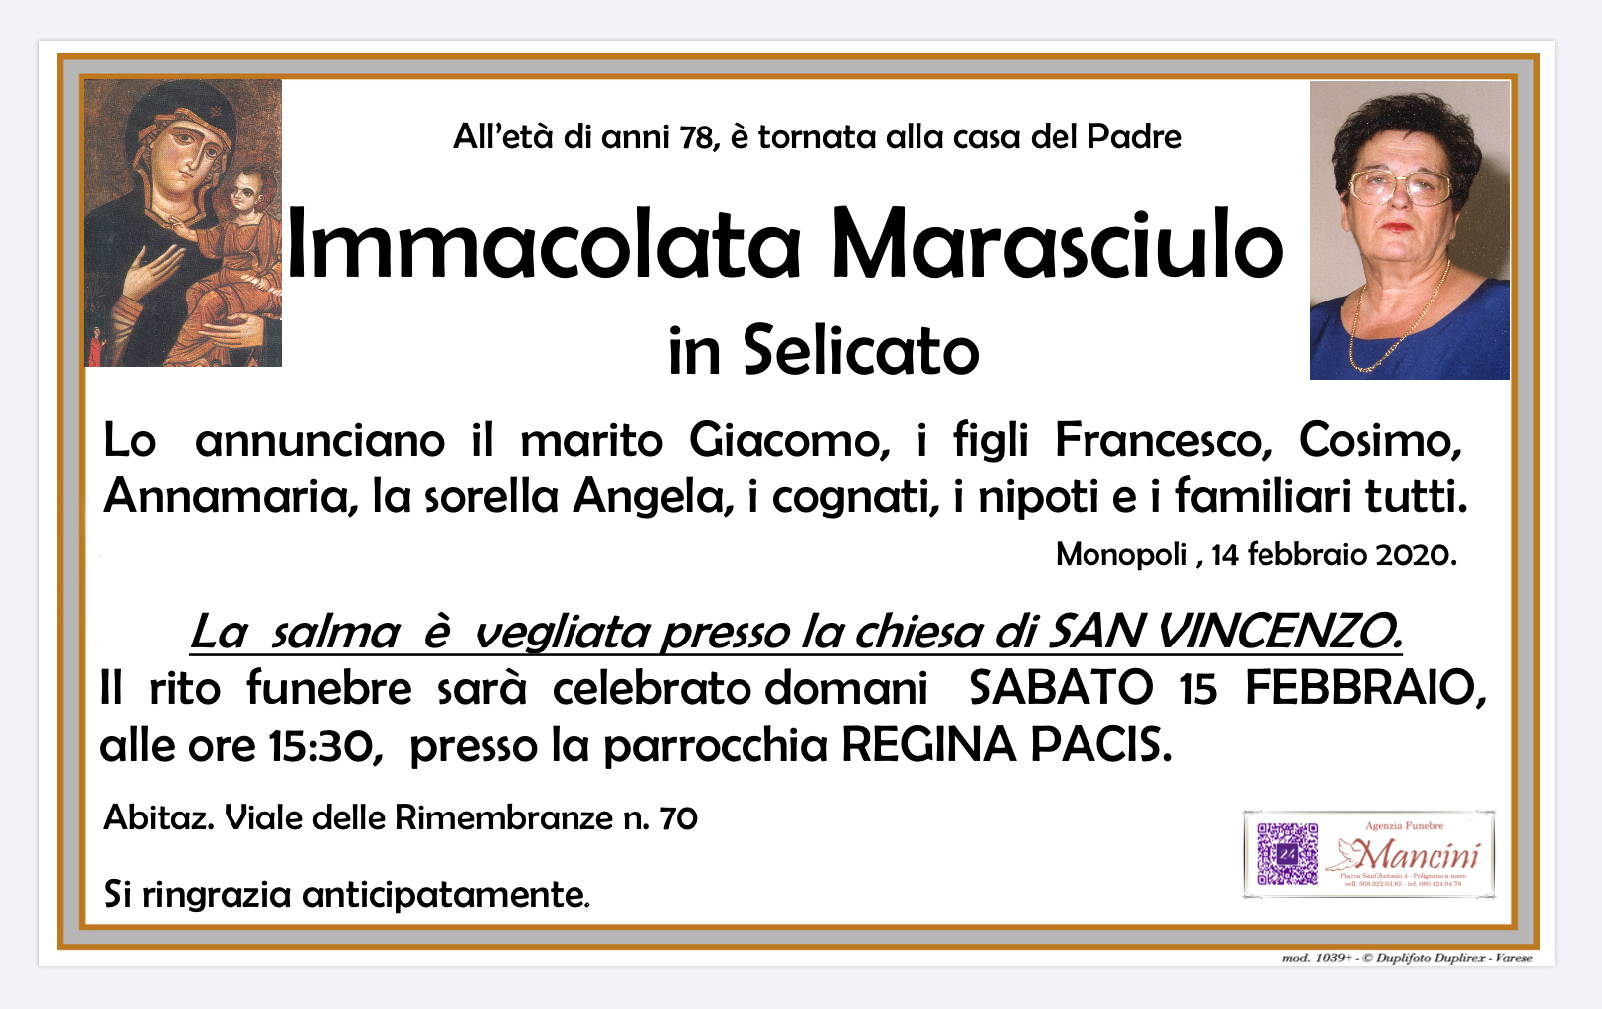 Immacolata Marasciulo